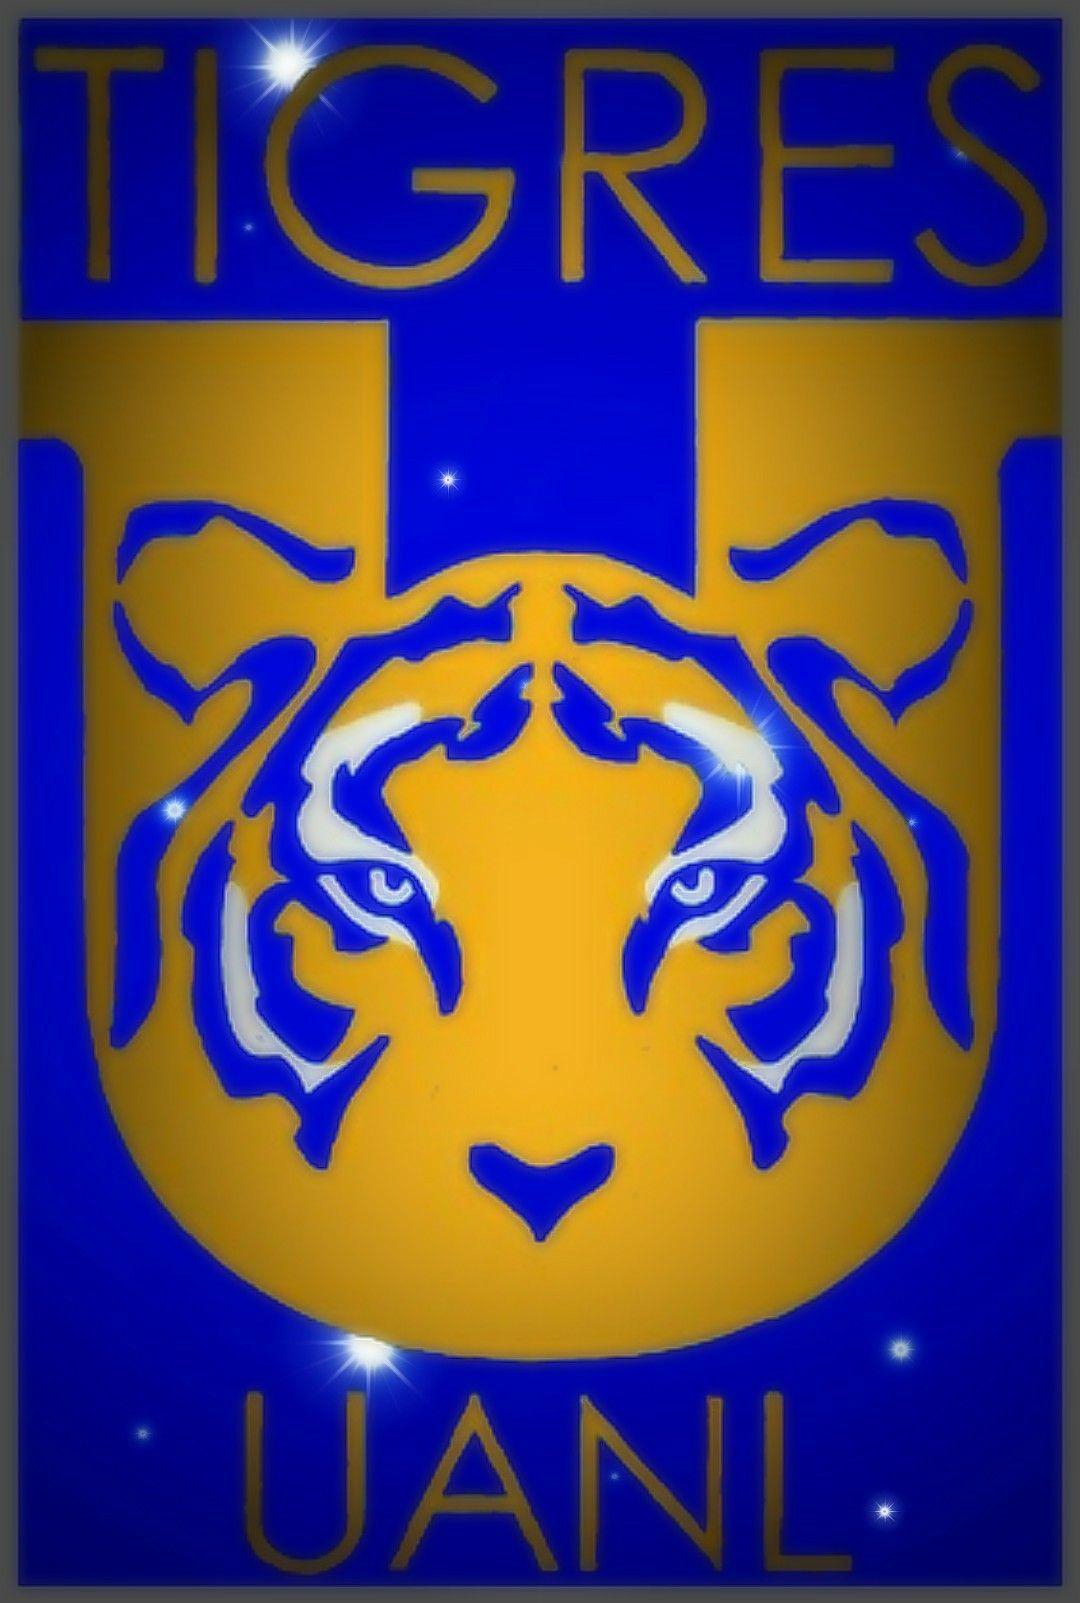 Tigres UANL Fondo de Pantalla Tigres uanl